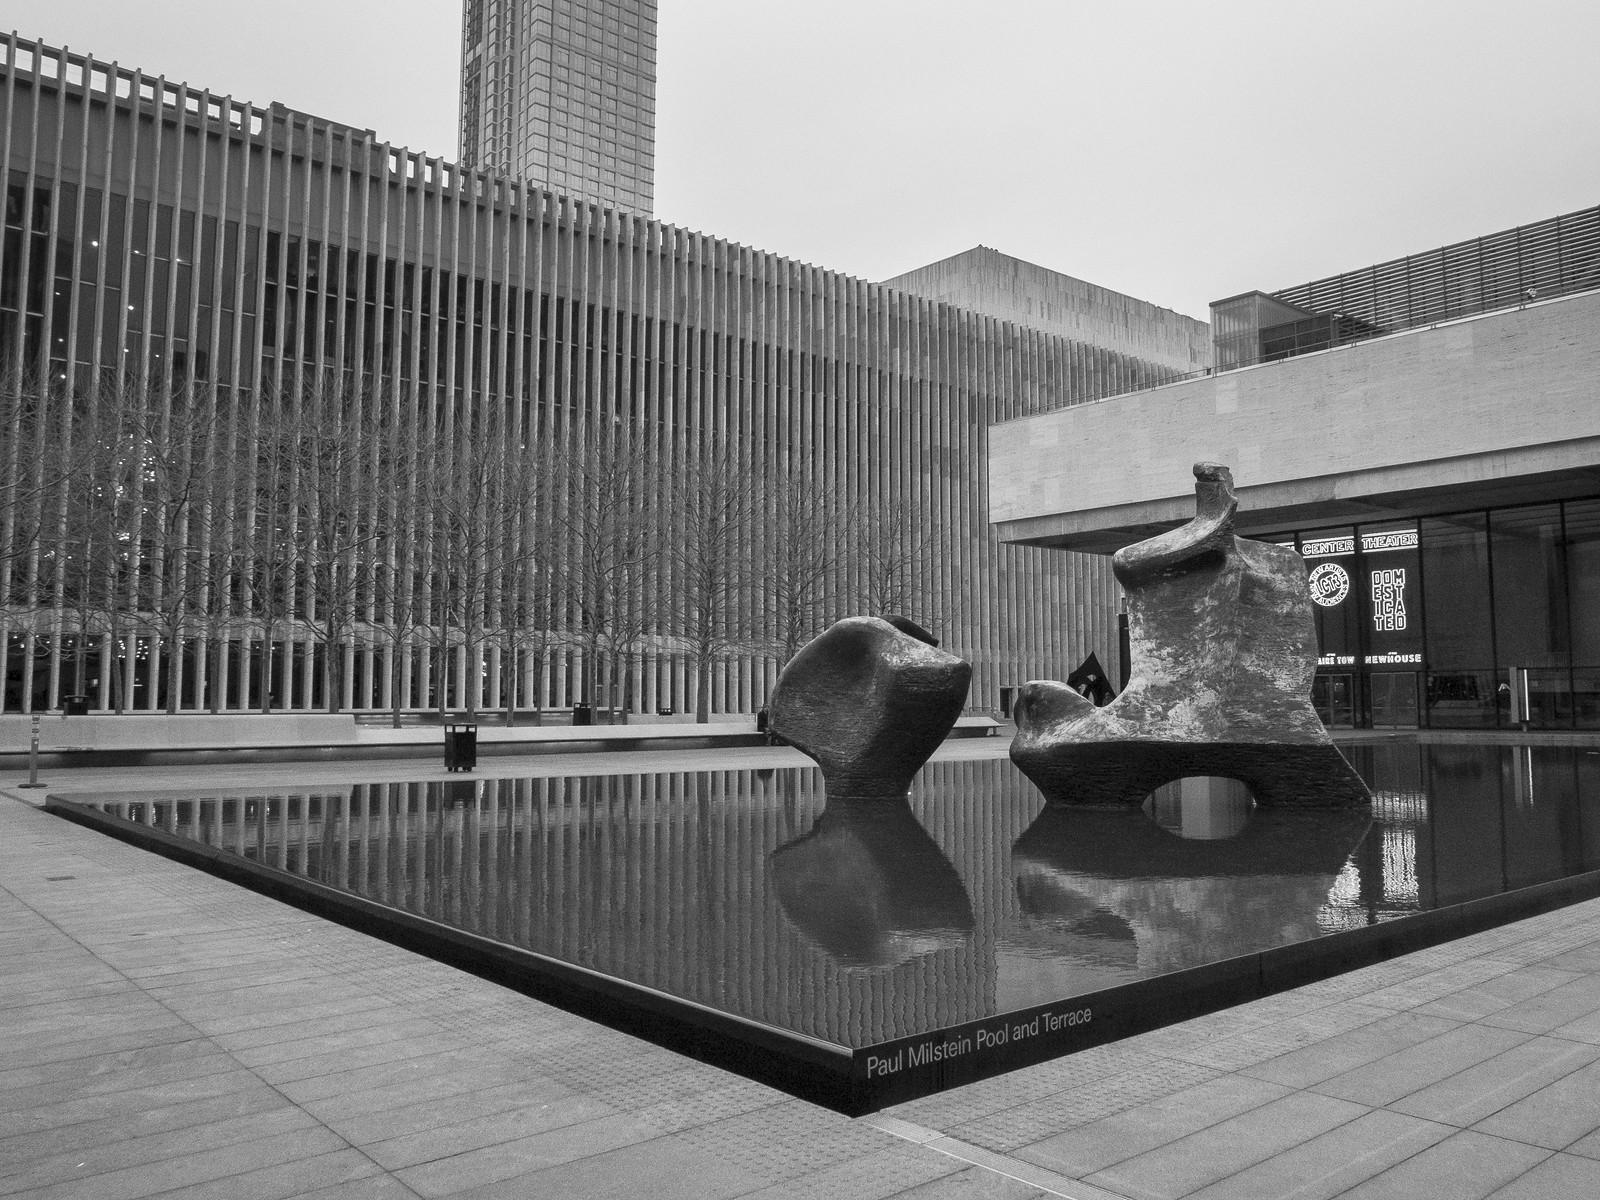 Paul Milstein Pool @ Lincoln Center by wwward0